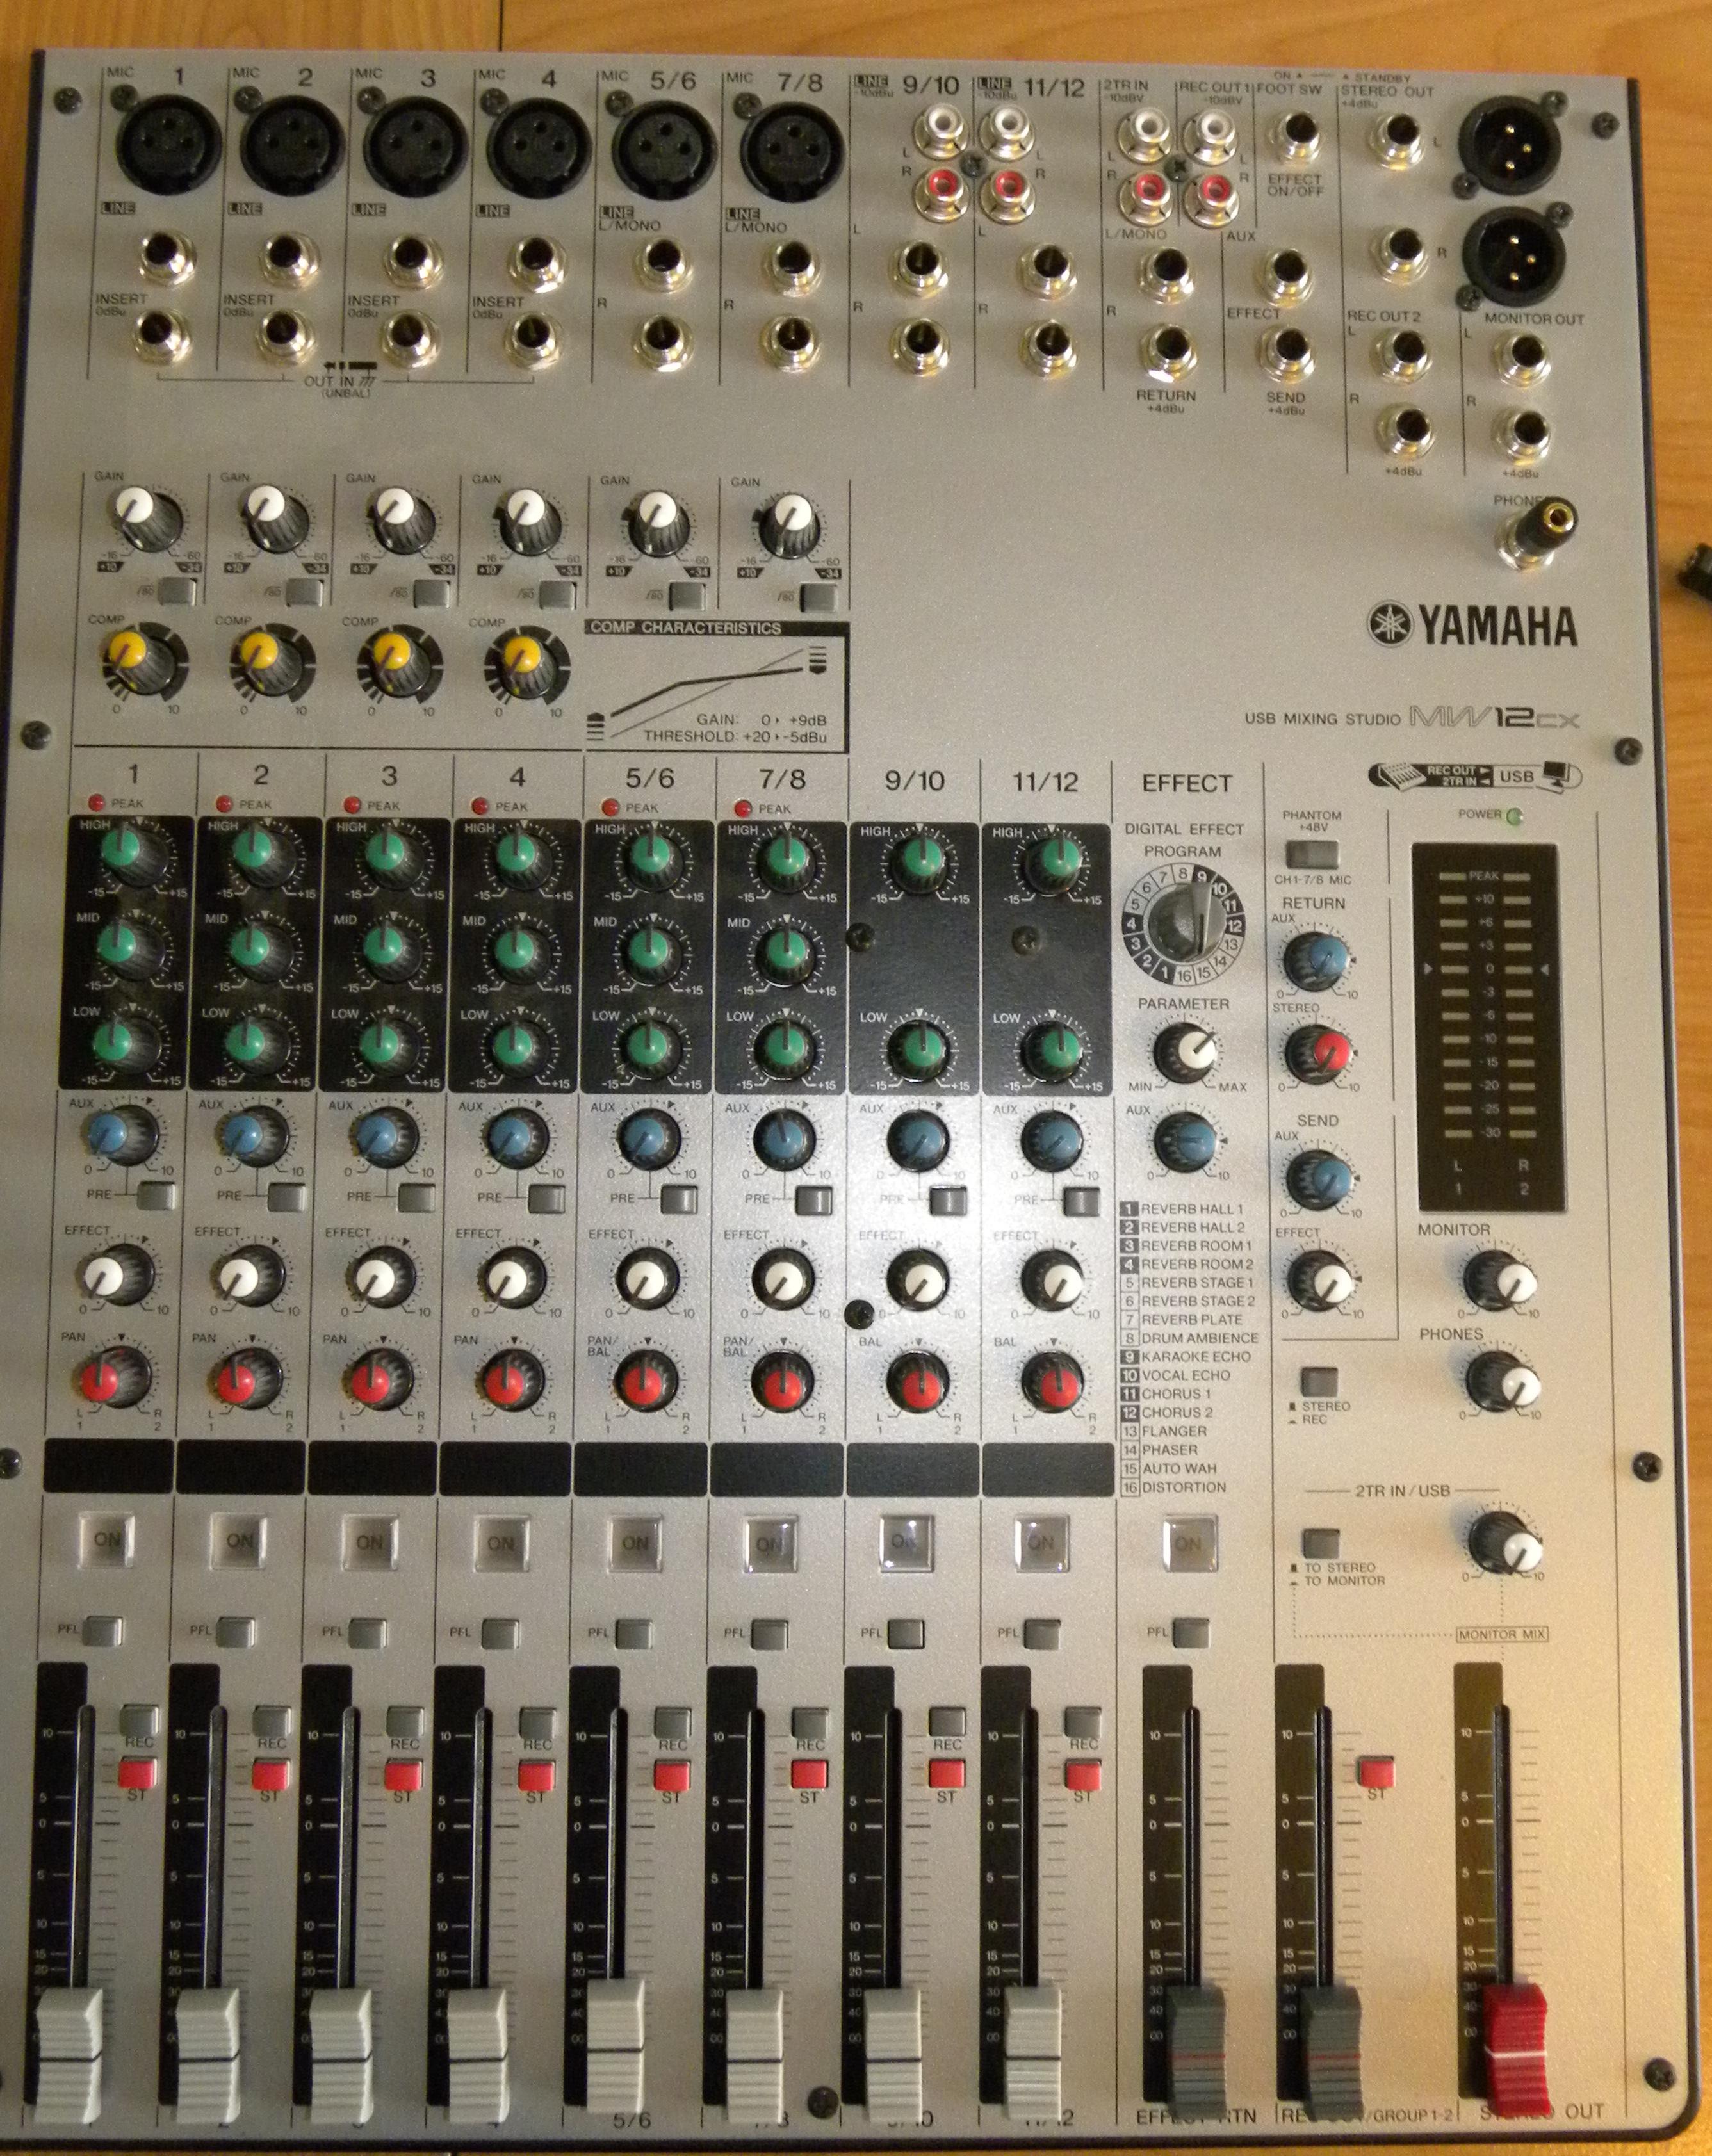 Yamaha Mw8 8-channel USB Mixing Studio Mixer W/user Manual MW8CX